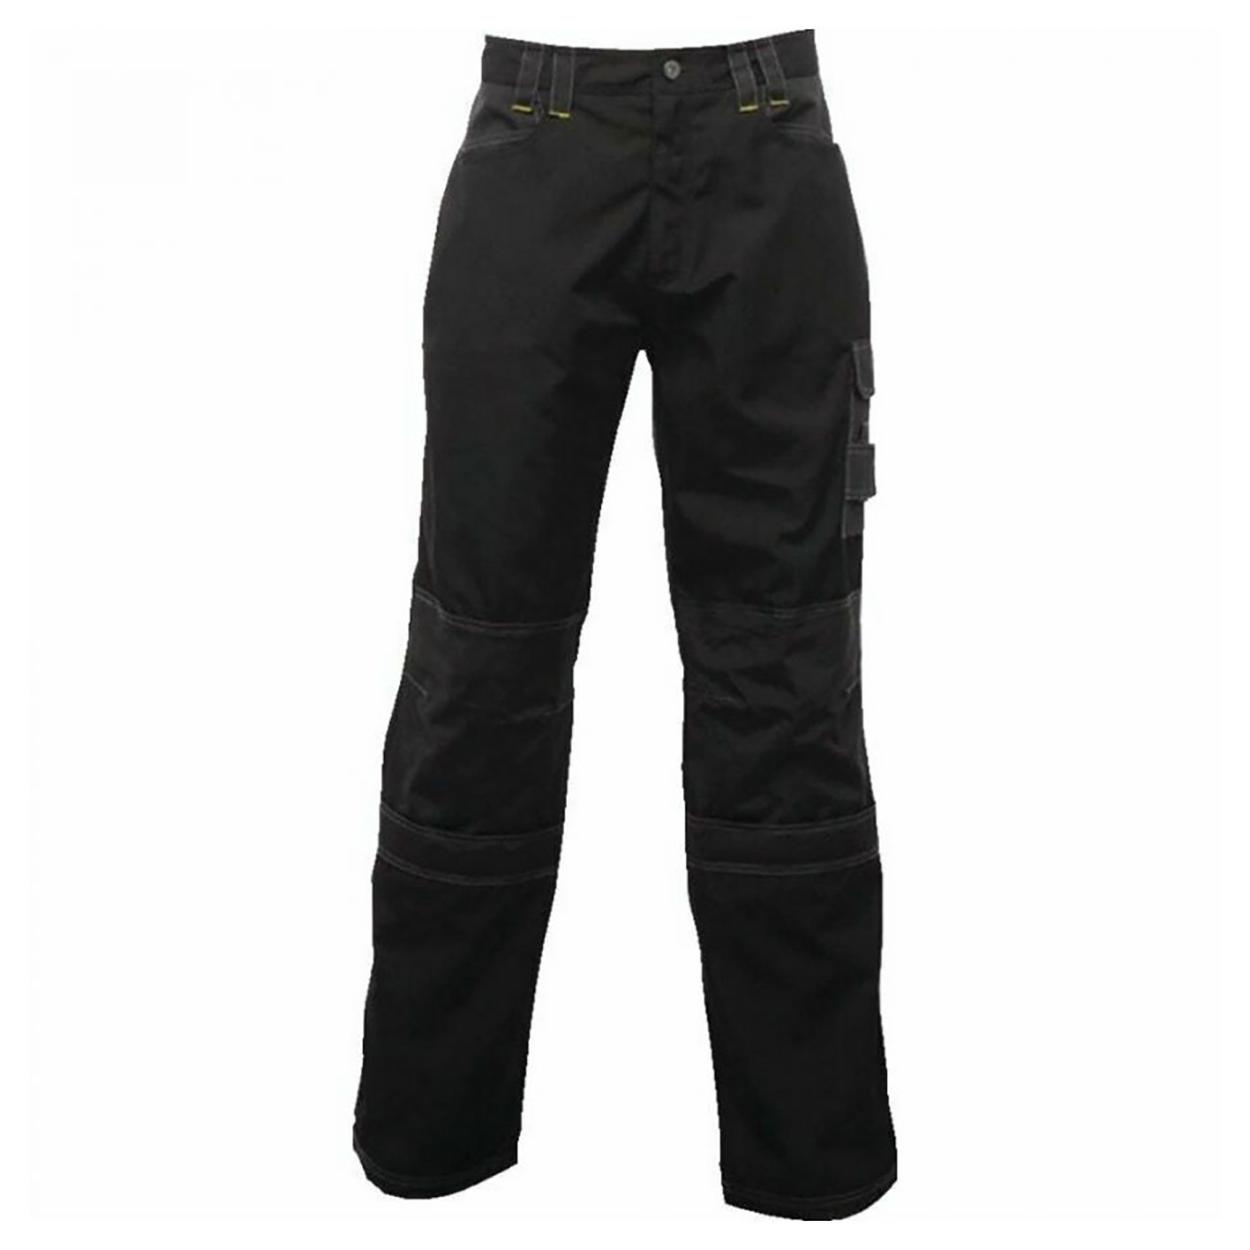 Regatta Mens Holster Workwear Trousers (Short, Regular And Long) (28S) (Black)